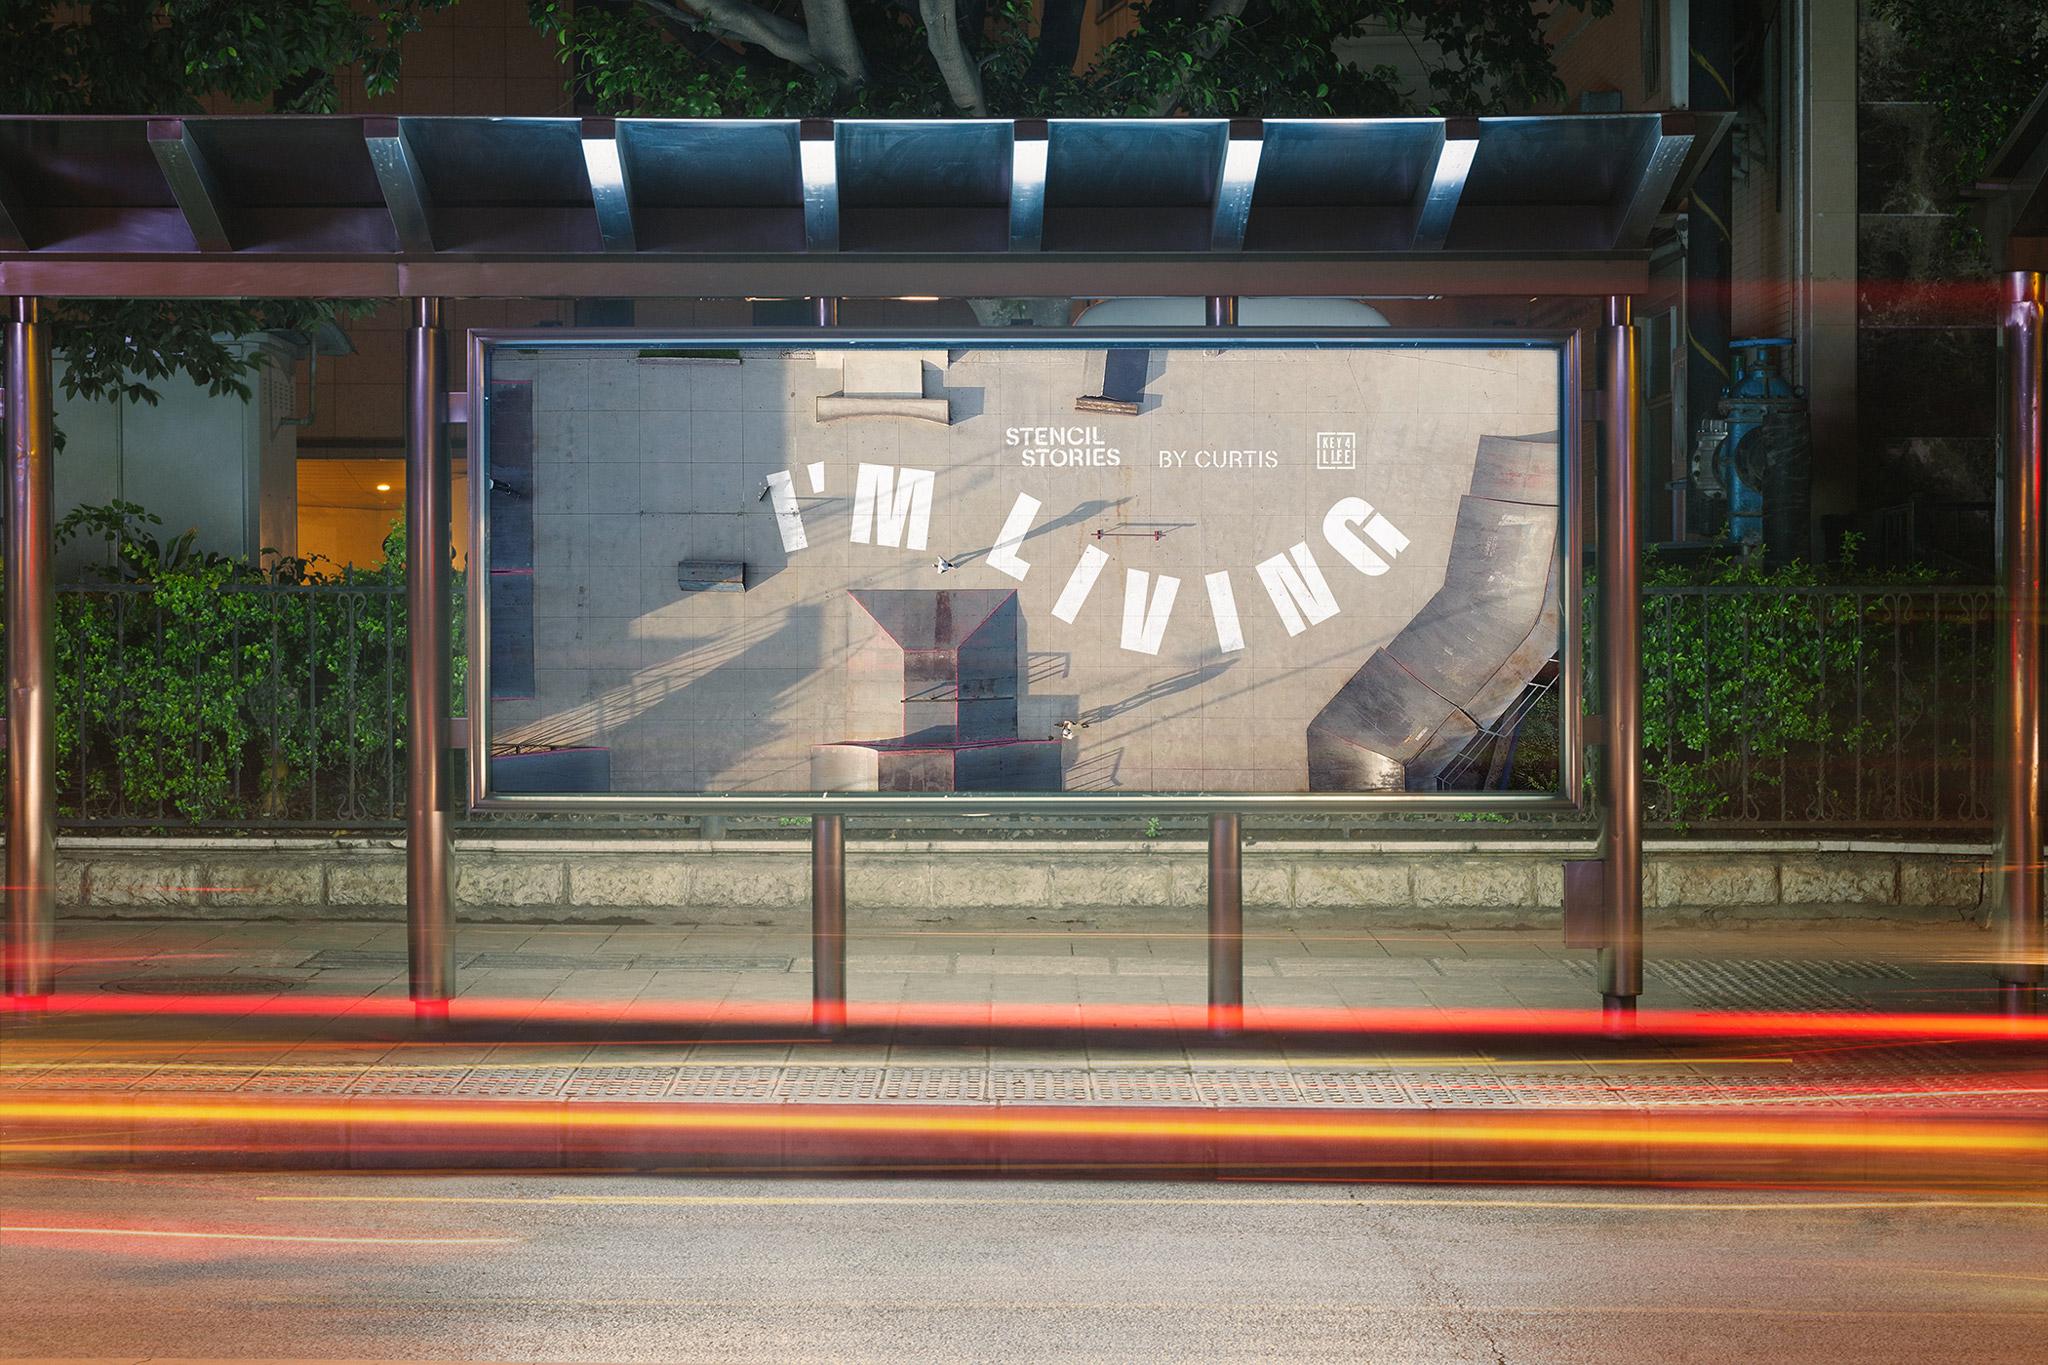 stencil-stories-poster-bus